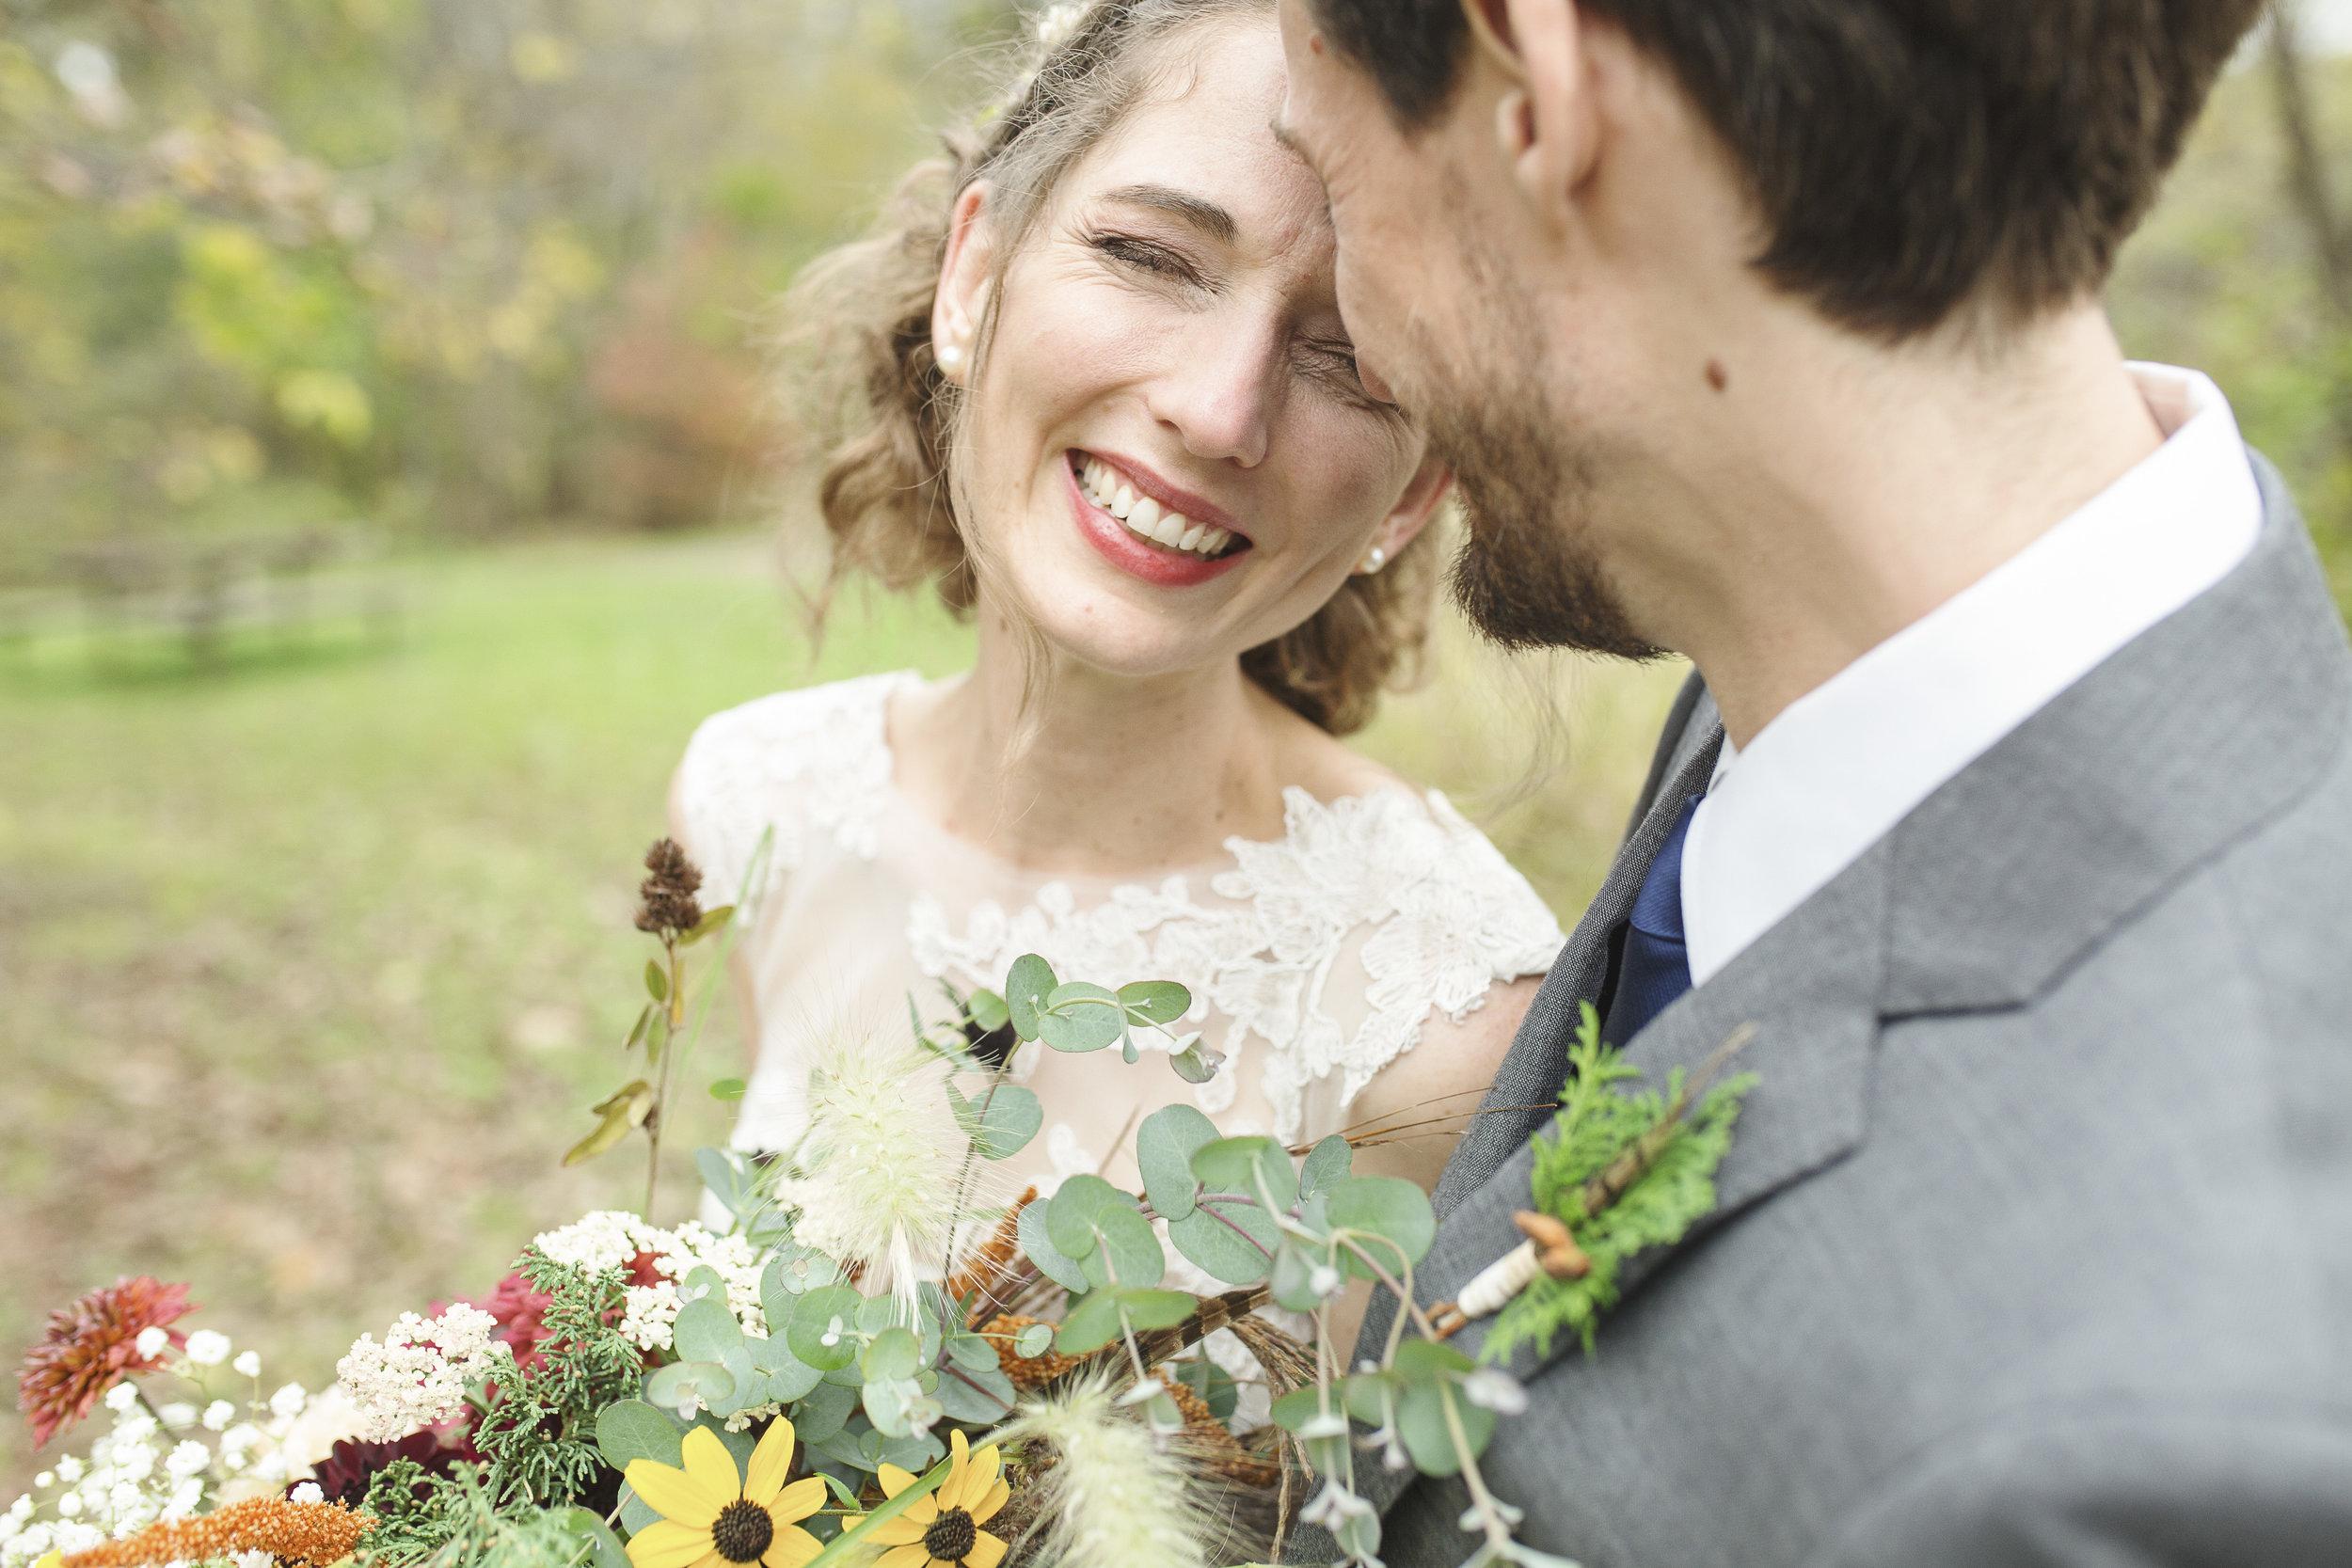 Stillwater_MN_Wedding_Photographer_11.jpg